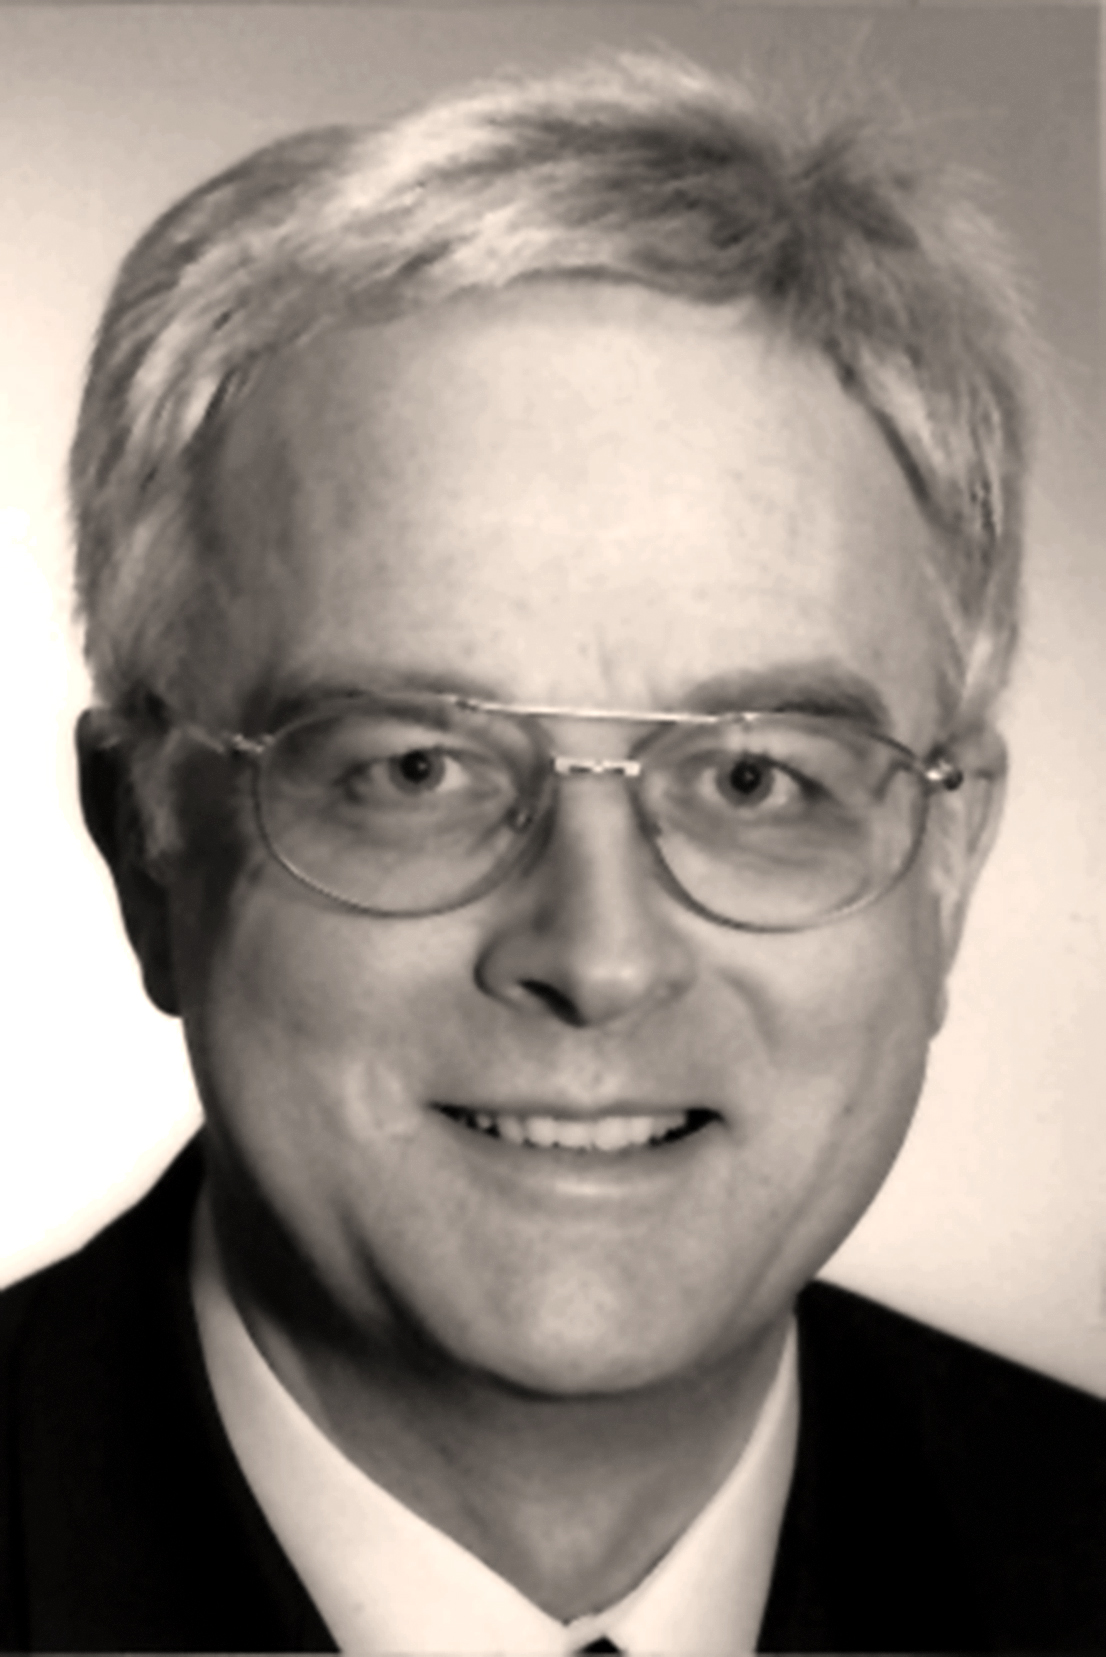 Karl-Heinz Menke